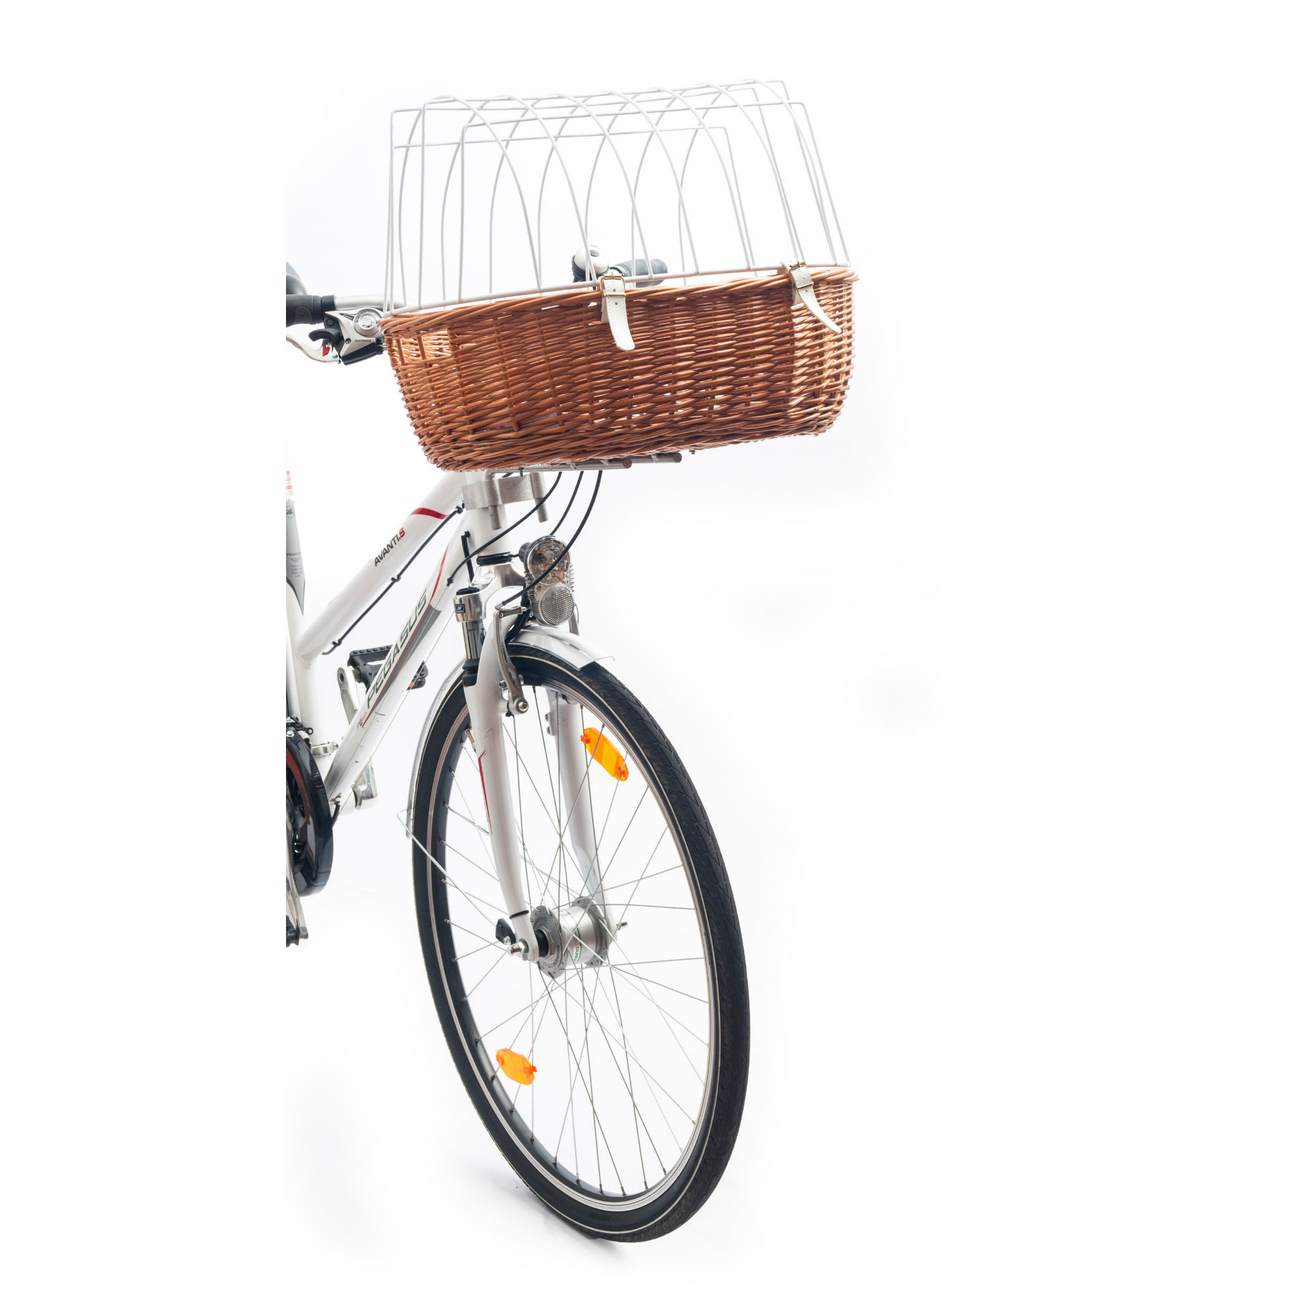 Aumüller E-Bike Hunde Fahrradkorb Standard vorne, Bild 2